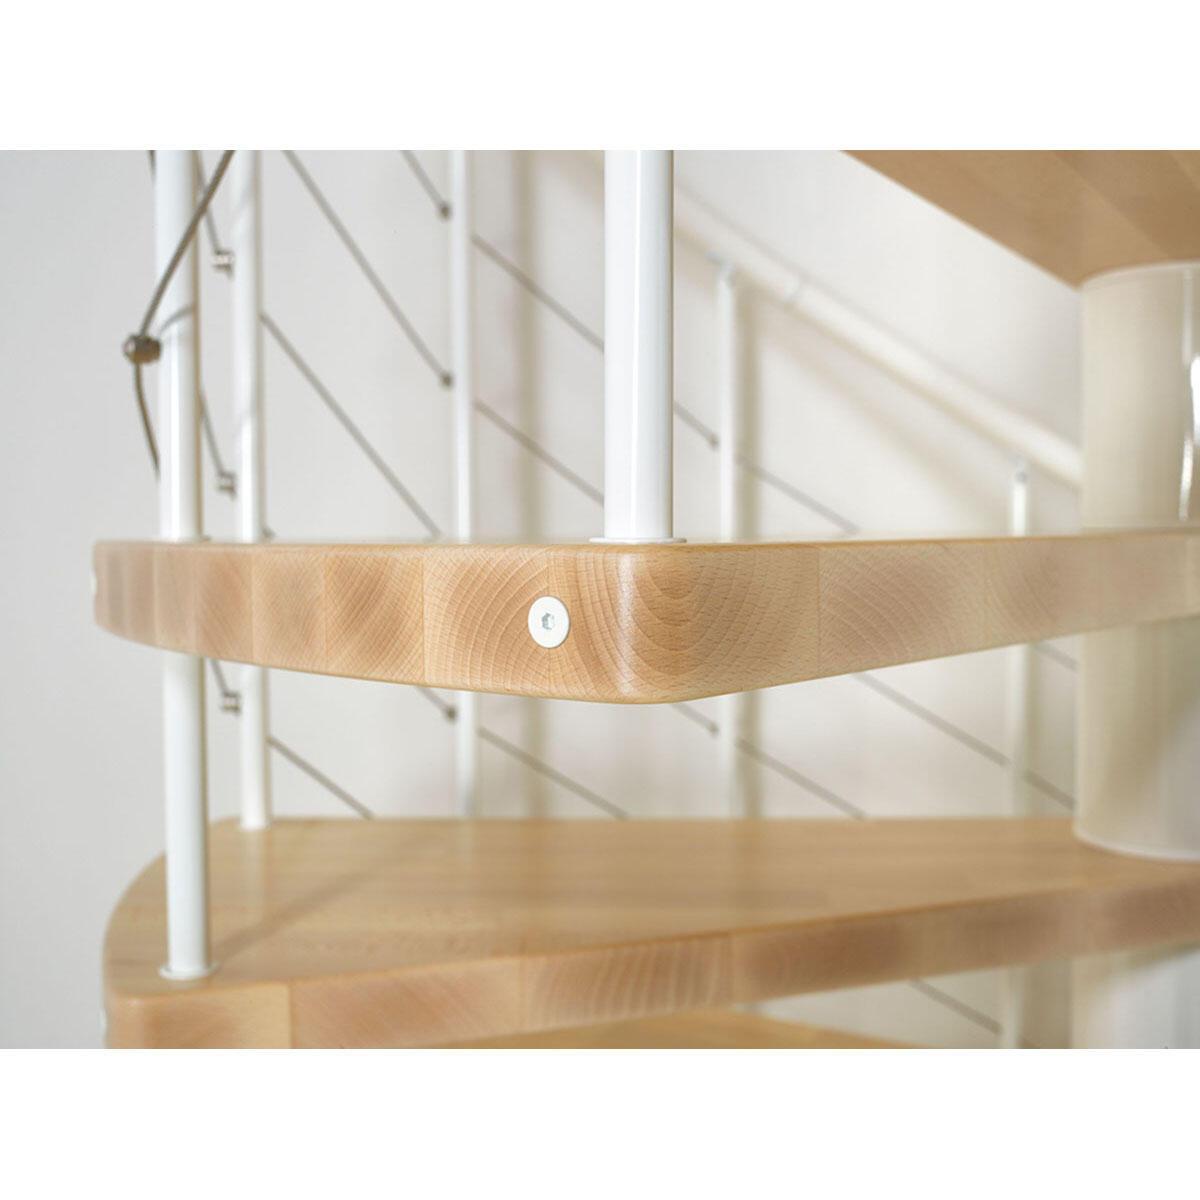 Scala a chiocciola tonda Symphonie FONTANOT L 120 cm, gradino noce, struttura bianco - 5